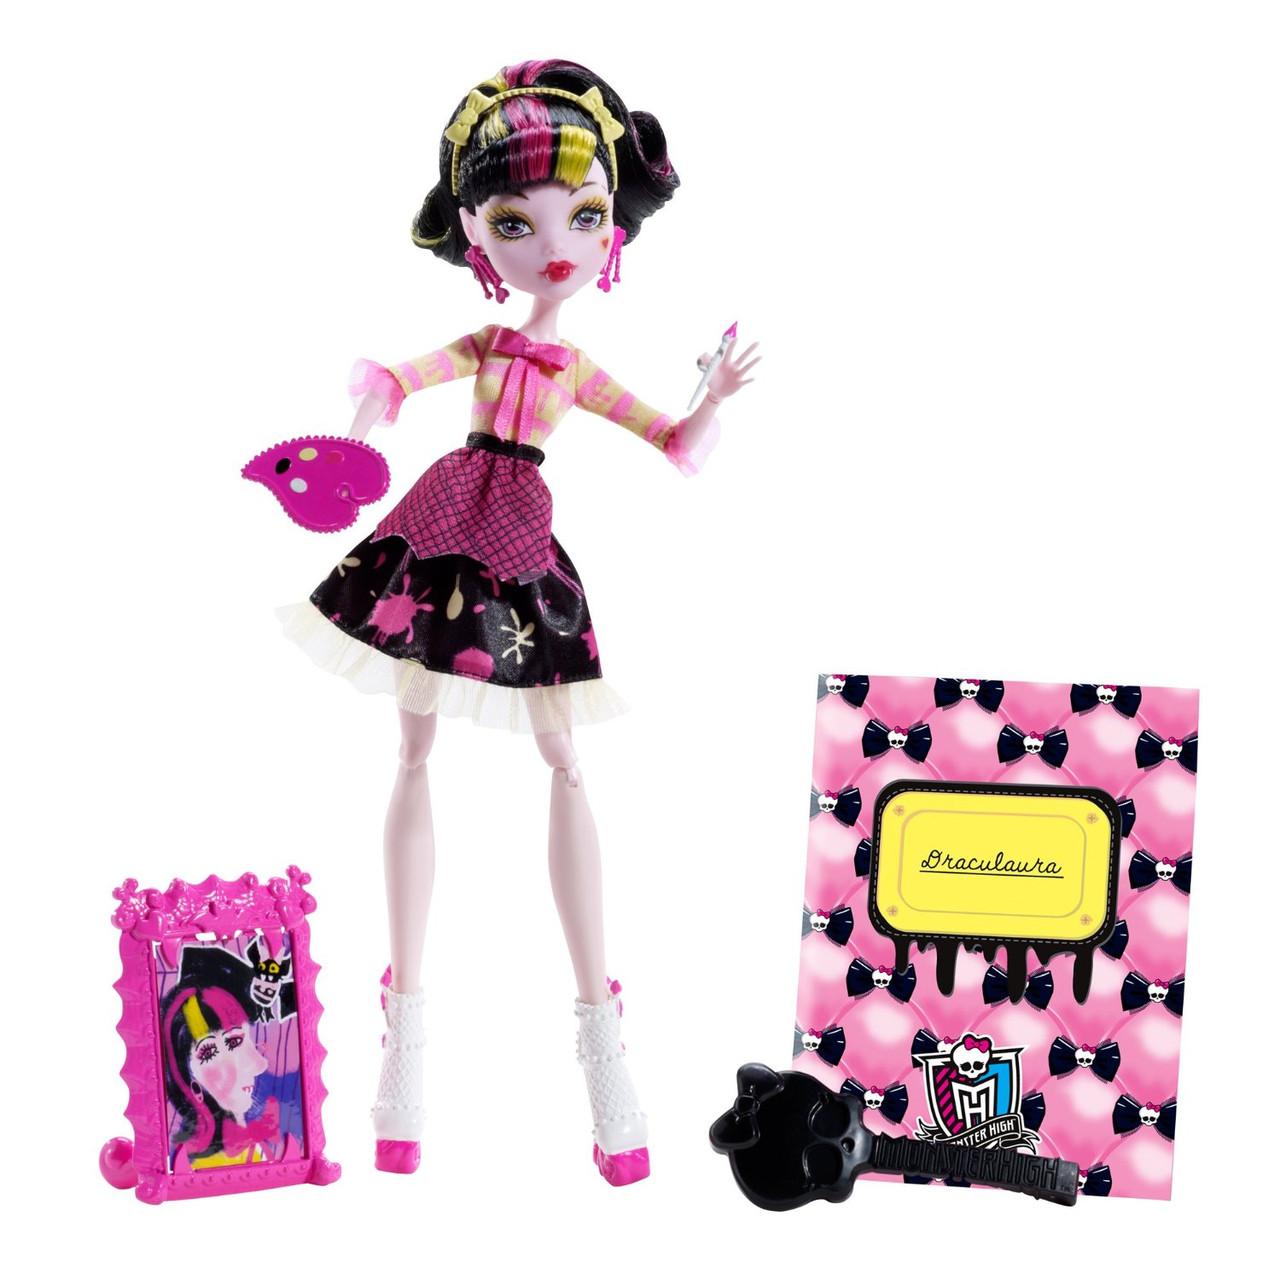 Дракулаура Арт Класс  (Art Class Draculaura Doll)